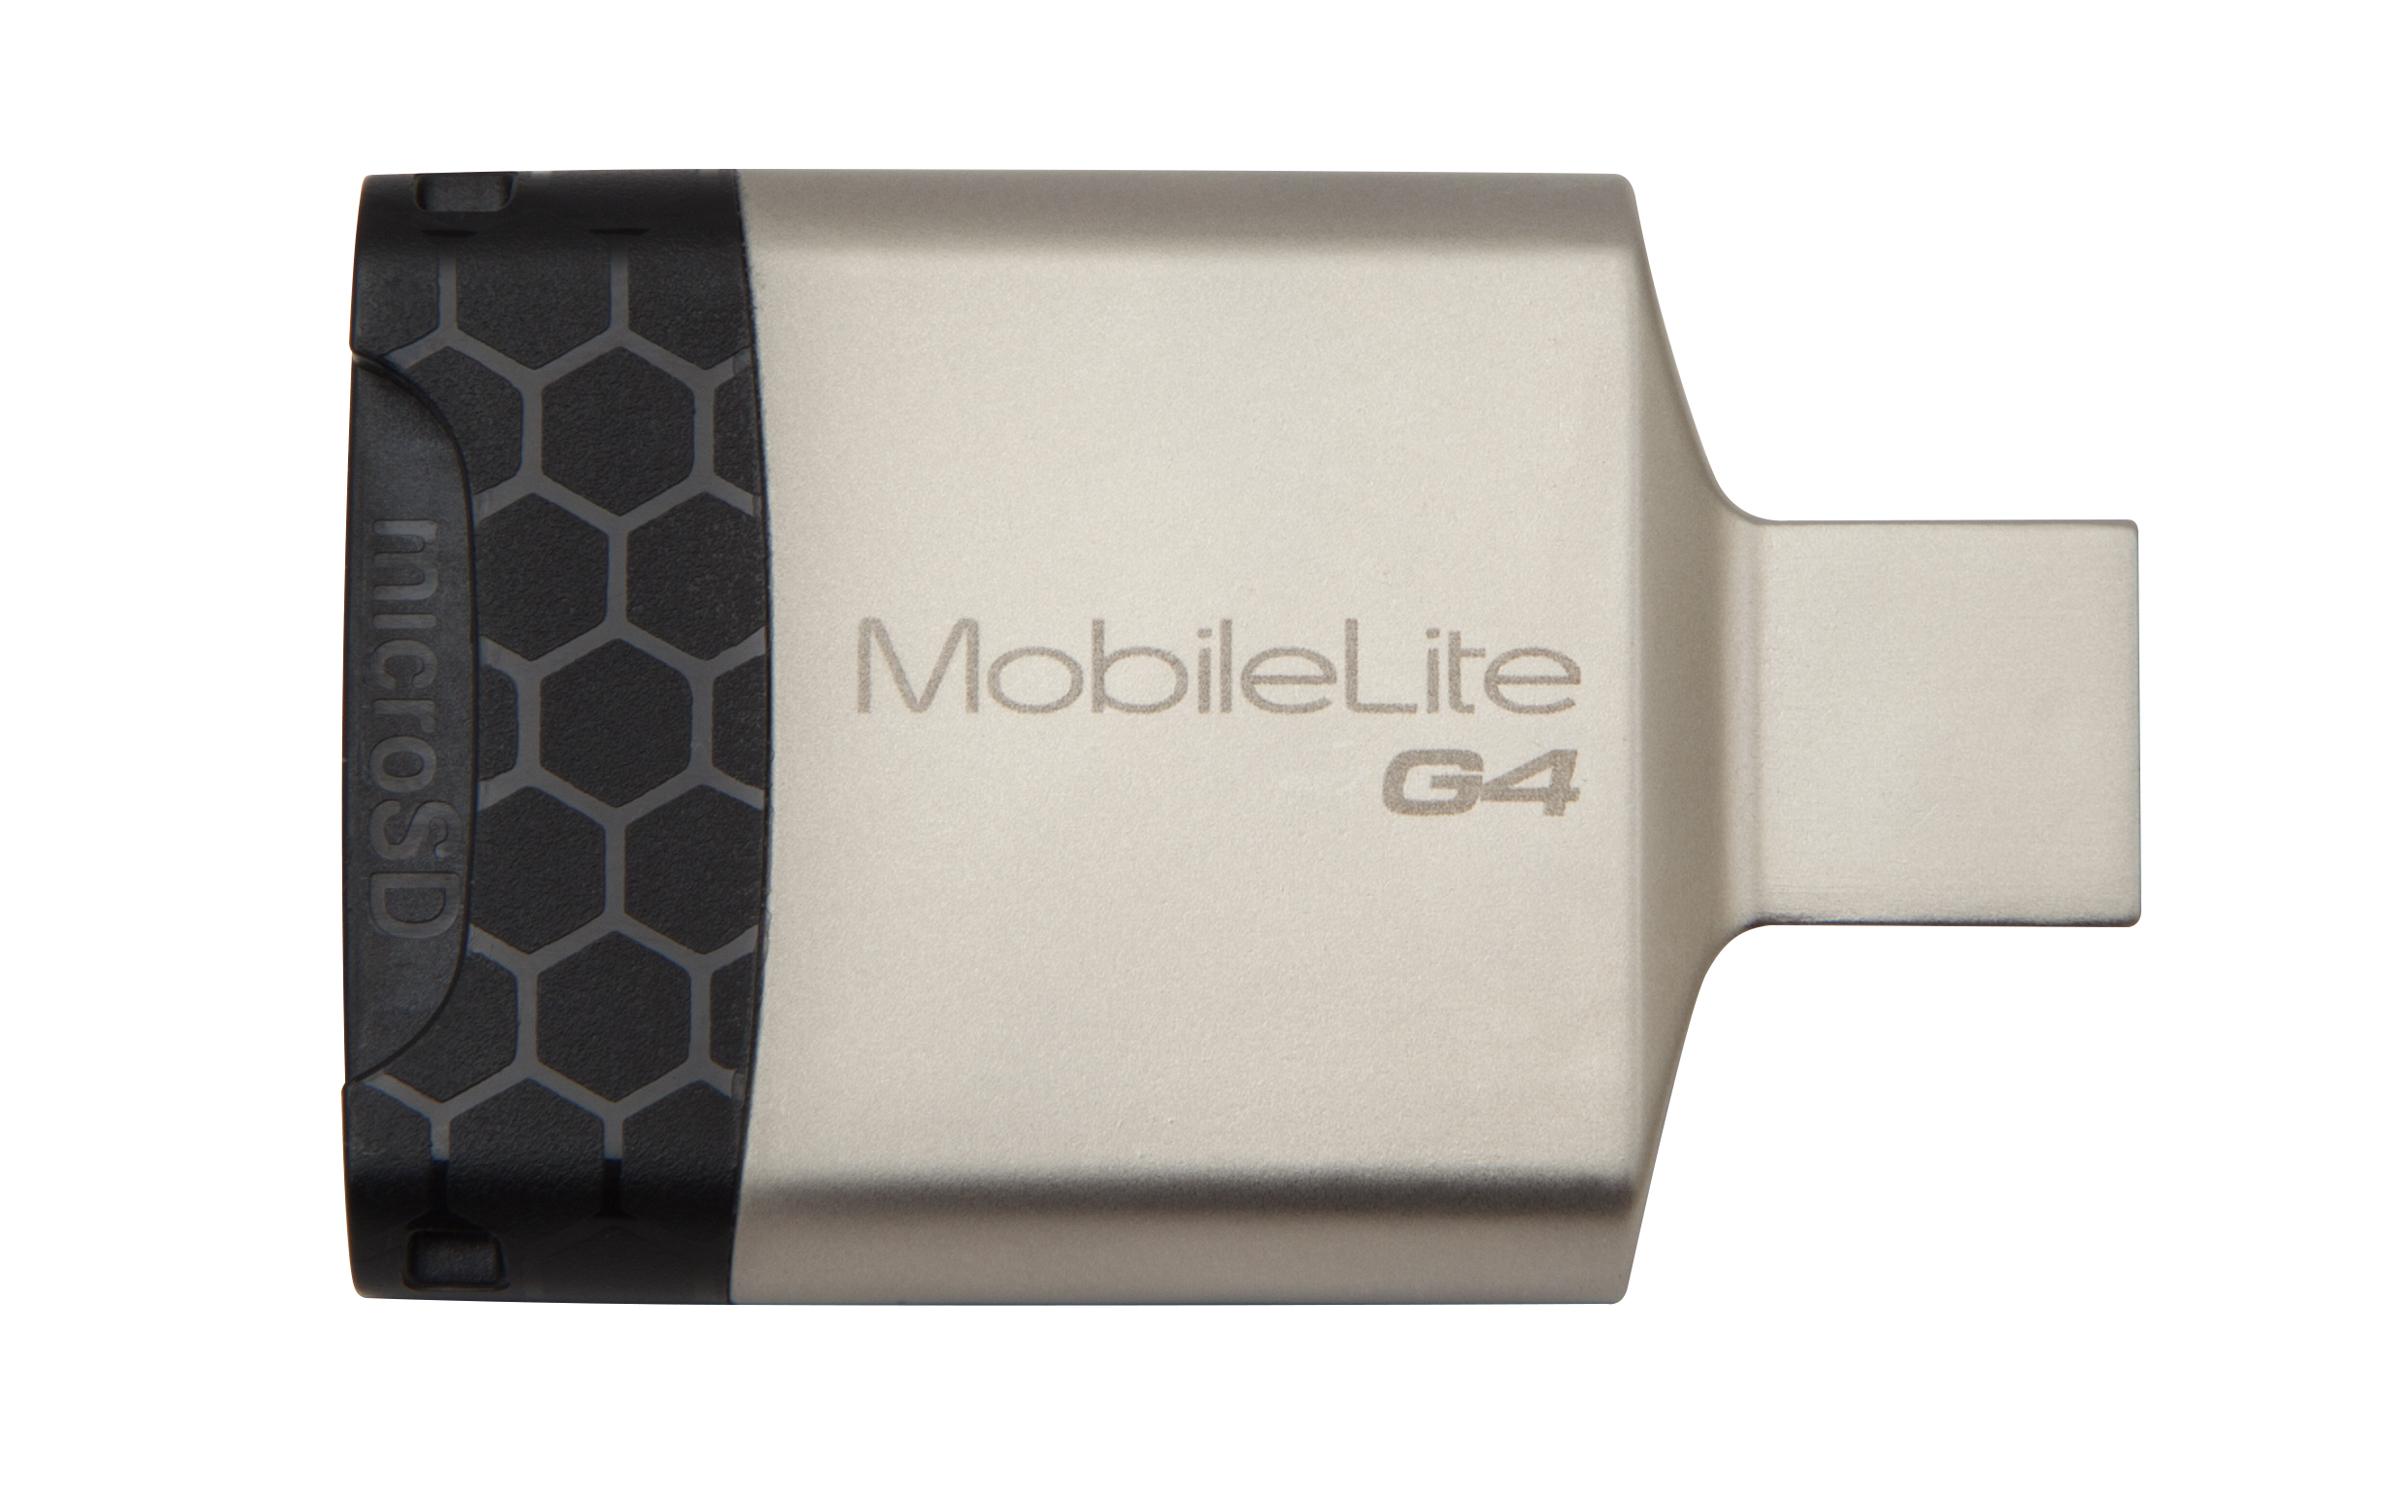 KINGSTON MobileLite G4 USB 3.0 Multi-Čtečka karet (microSDHC/SDHC/SDXC)